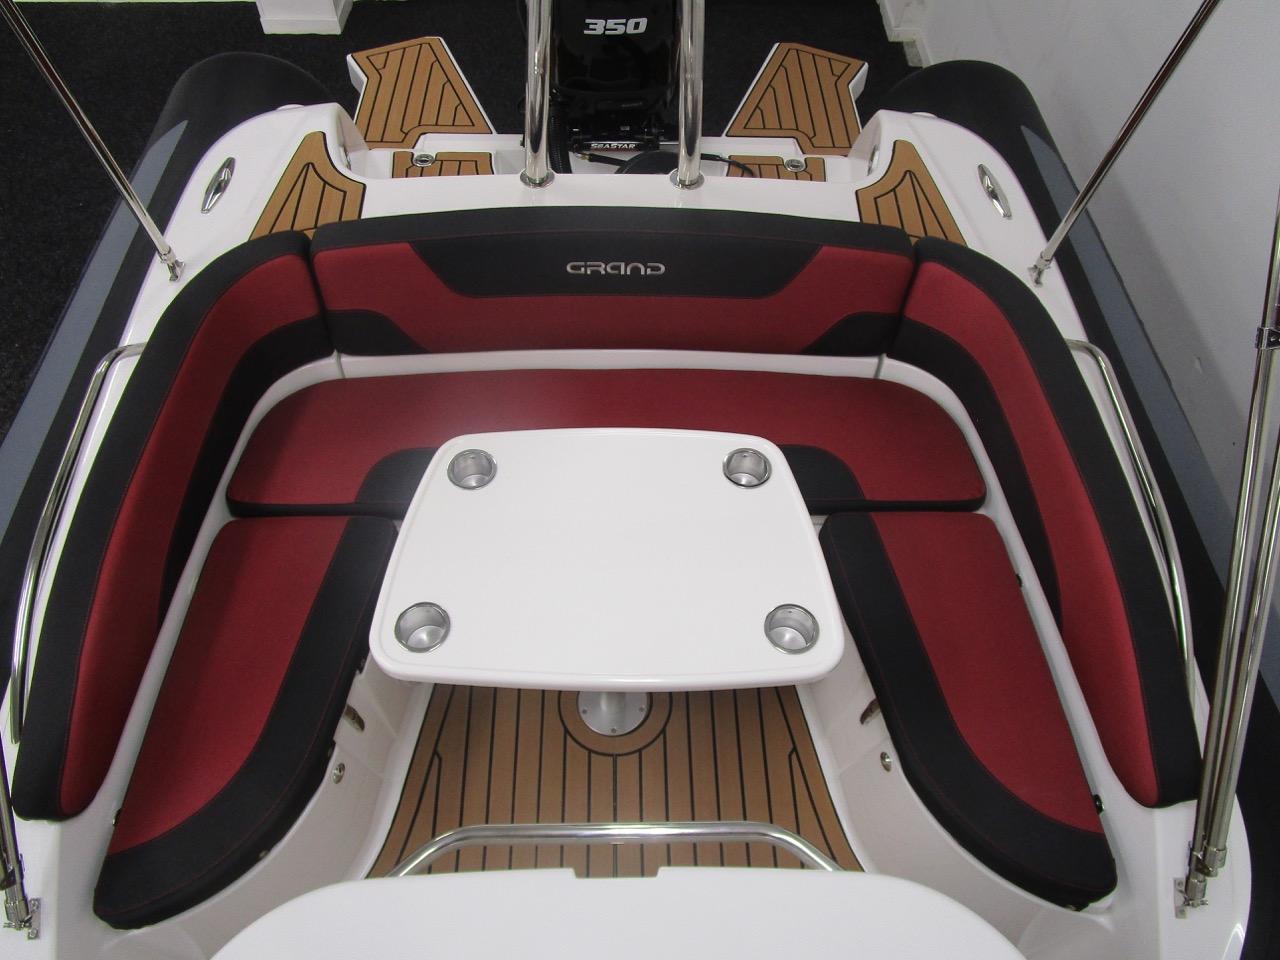 GRAND G850 RIB rear seat and table